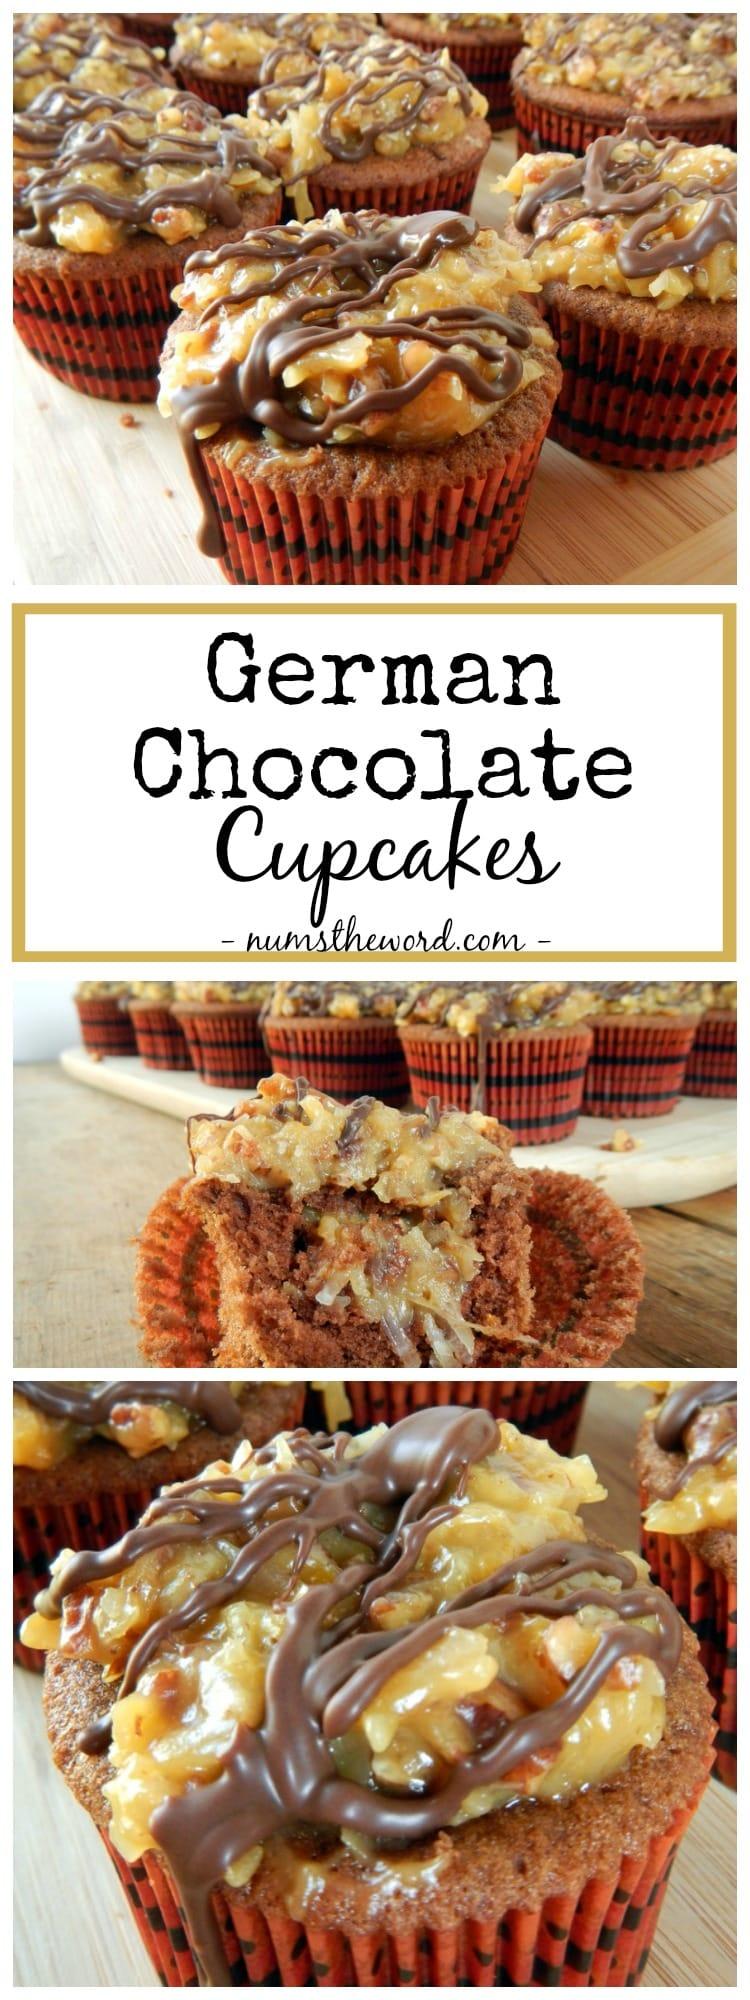 German Chocolate Cupcakes - NumsTheWord